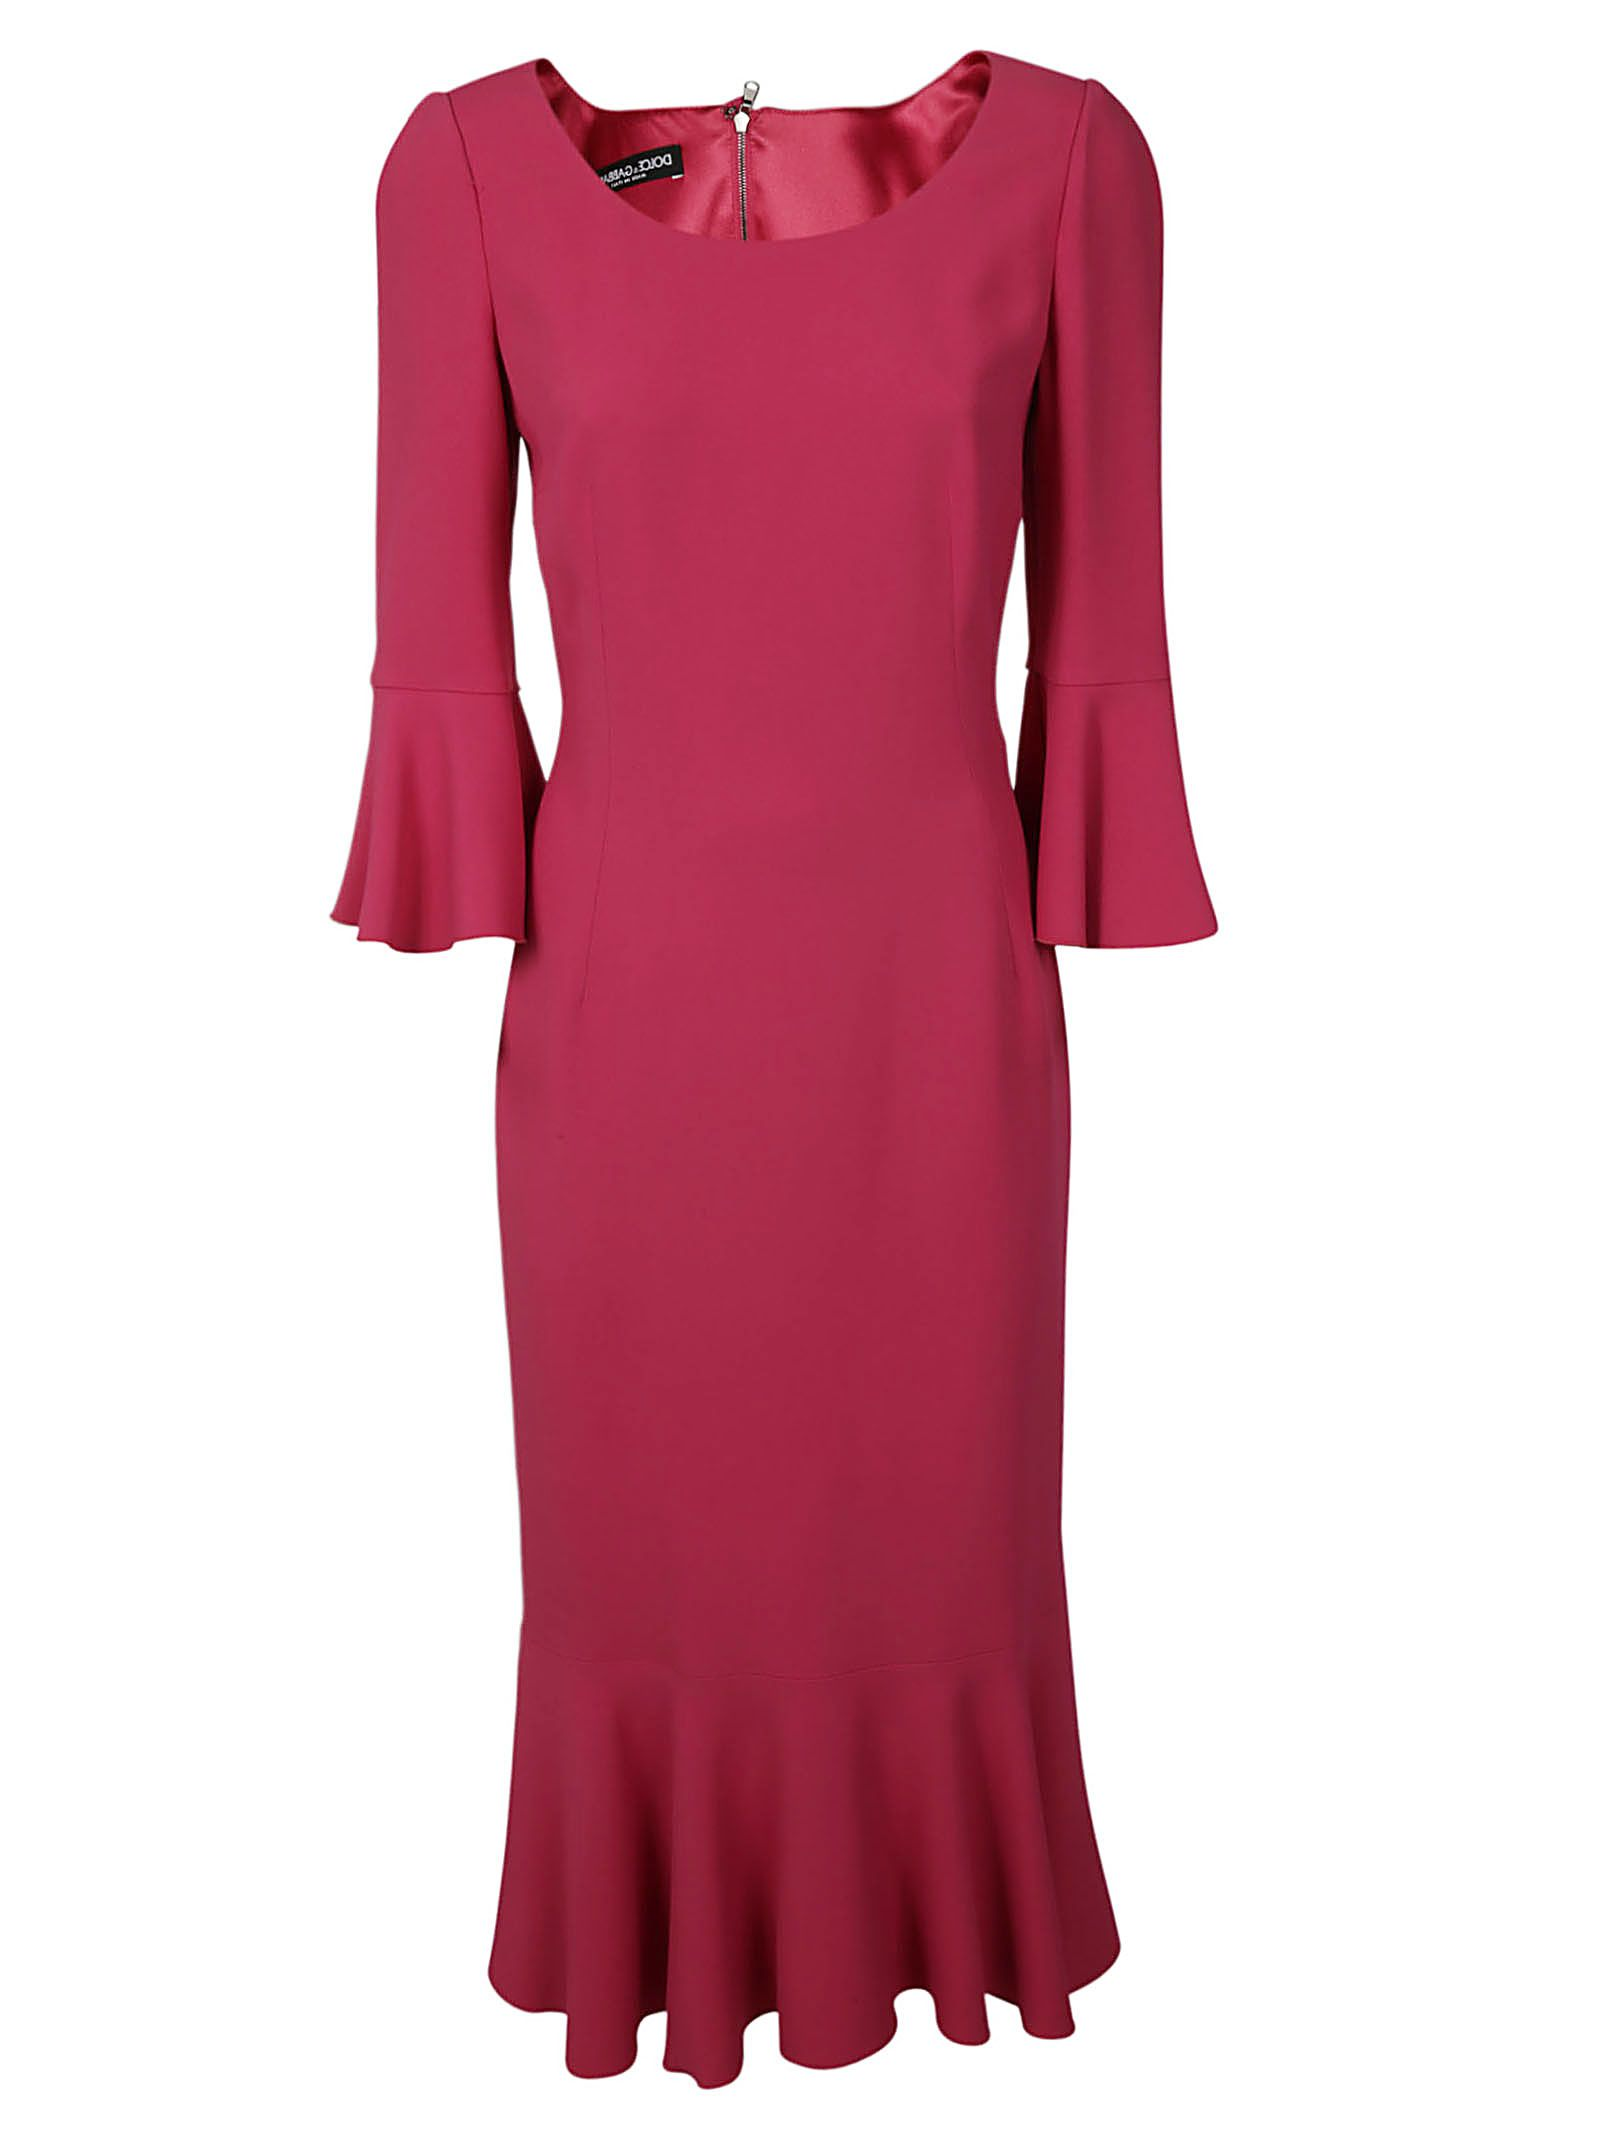 Dolce & Gabbana Frill Midi Dress